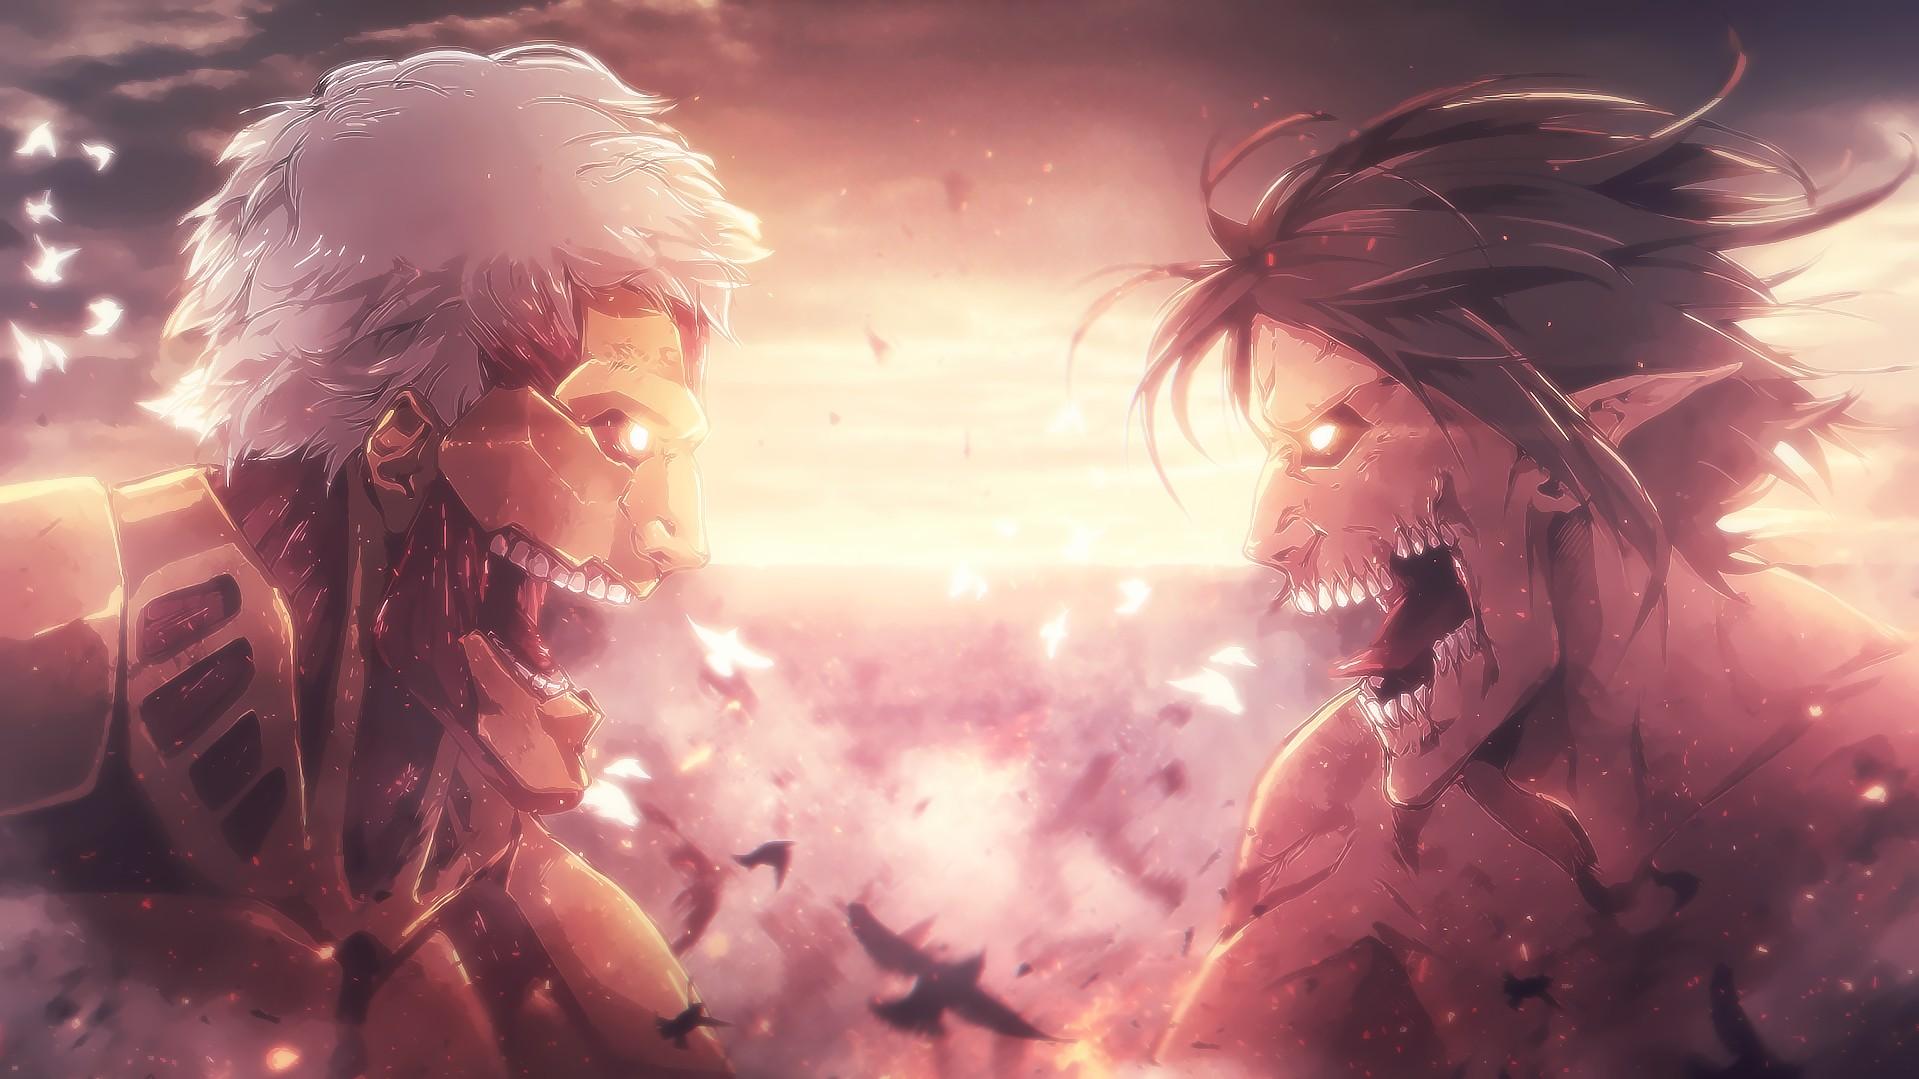 Wallpaper Engine - Shingeki no Kyojin Anime Soundtracks Animated Wallpaper